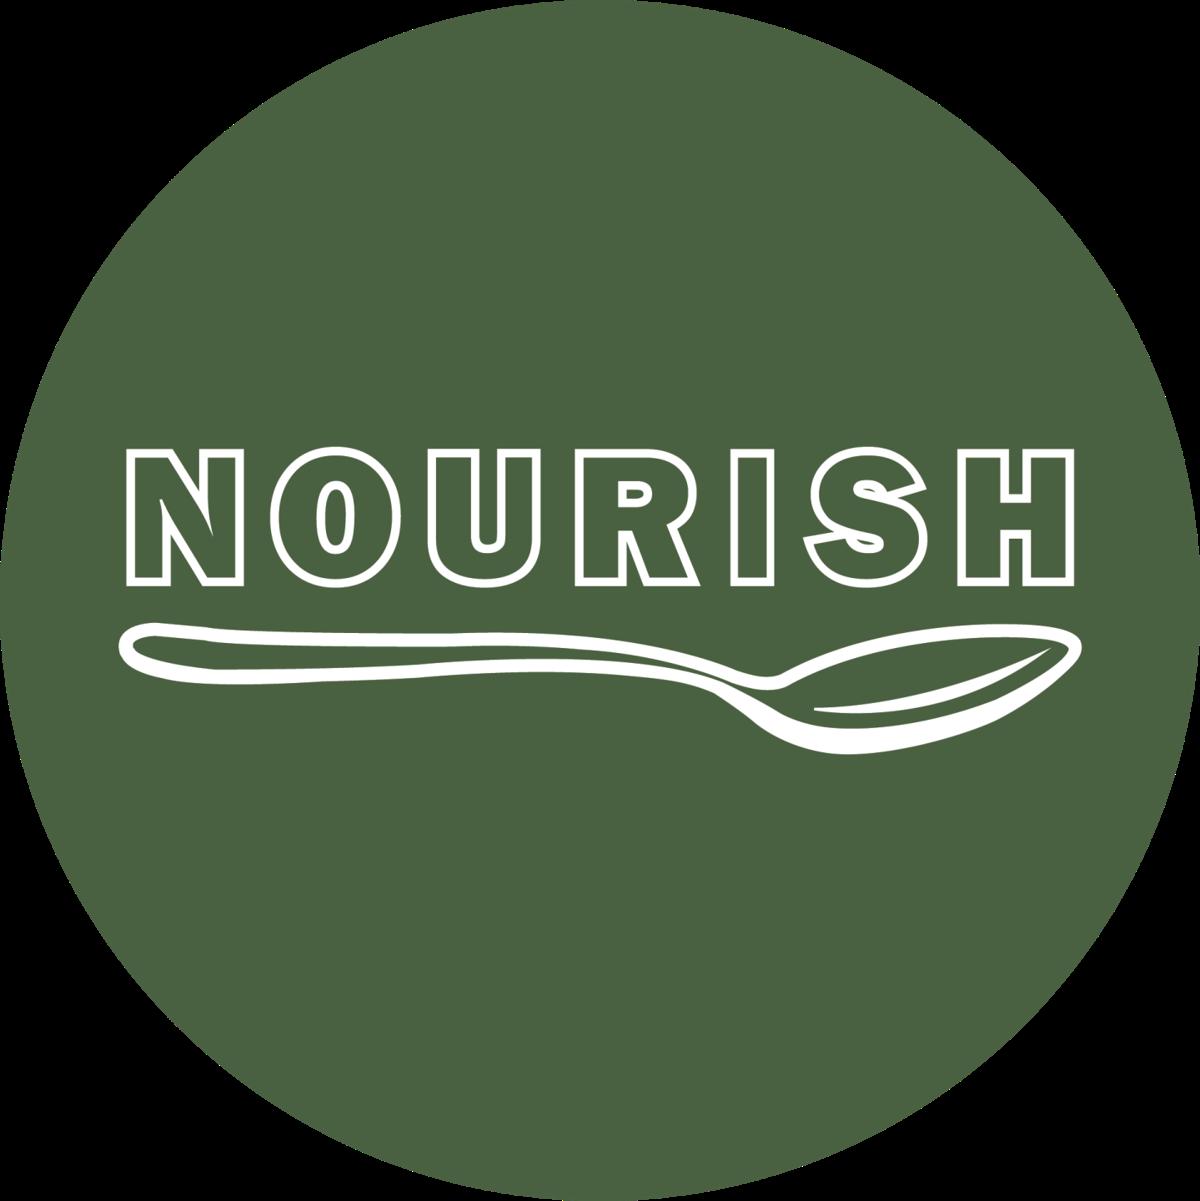 """Nourish"" LOGO"